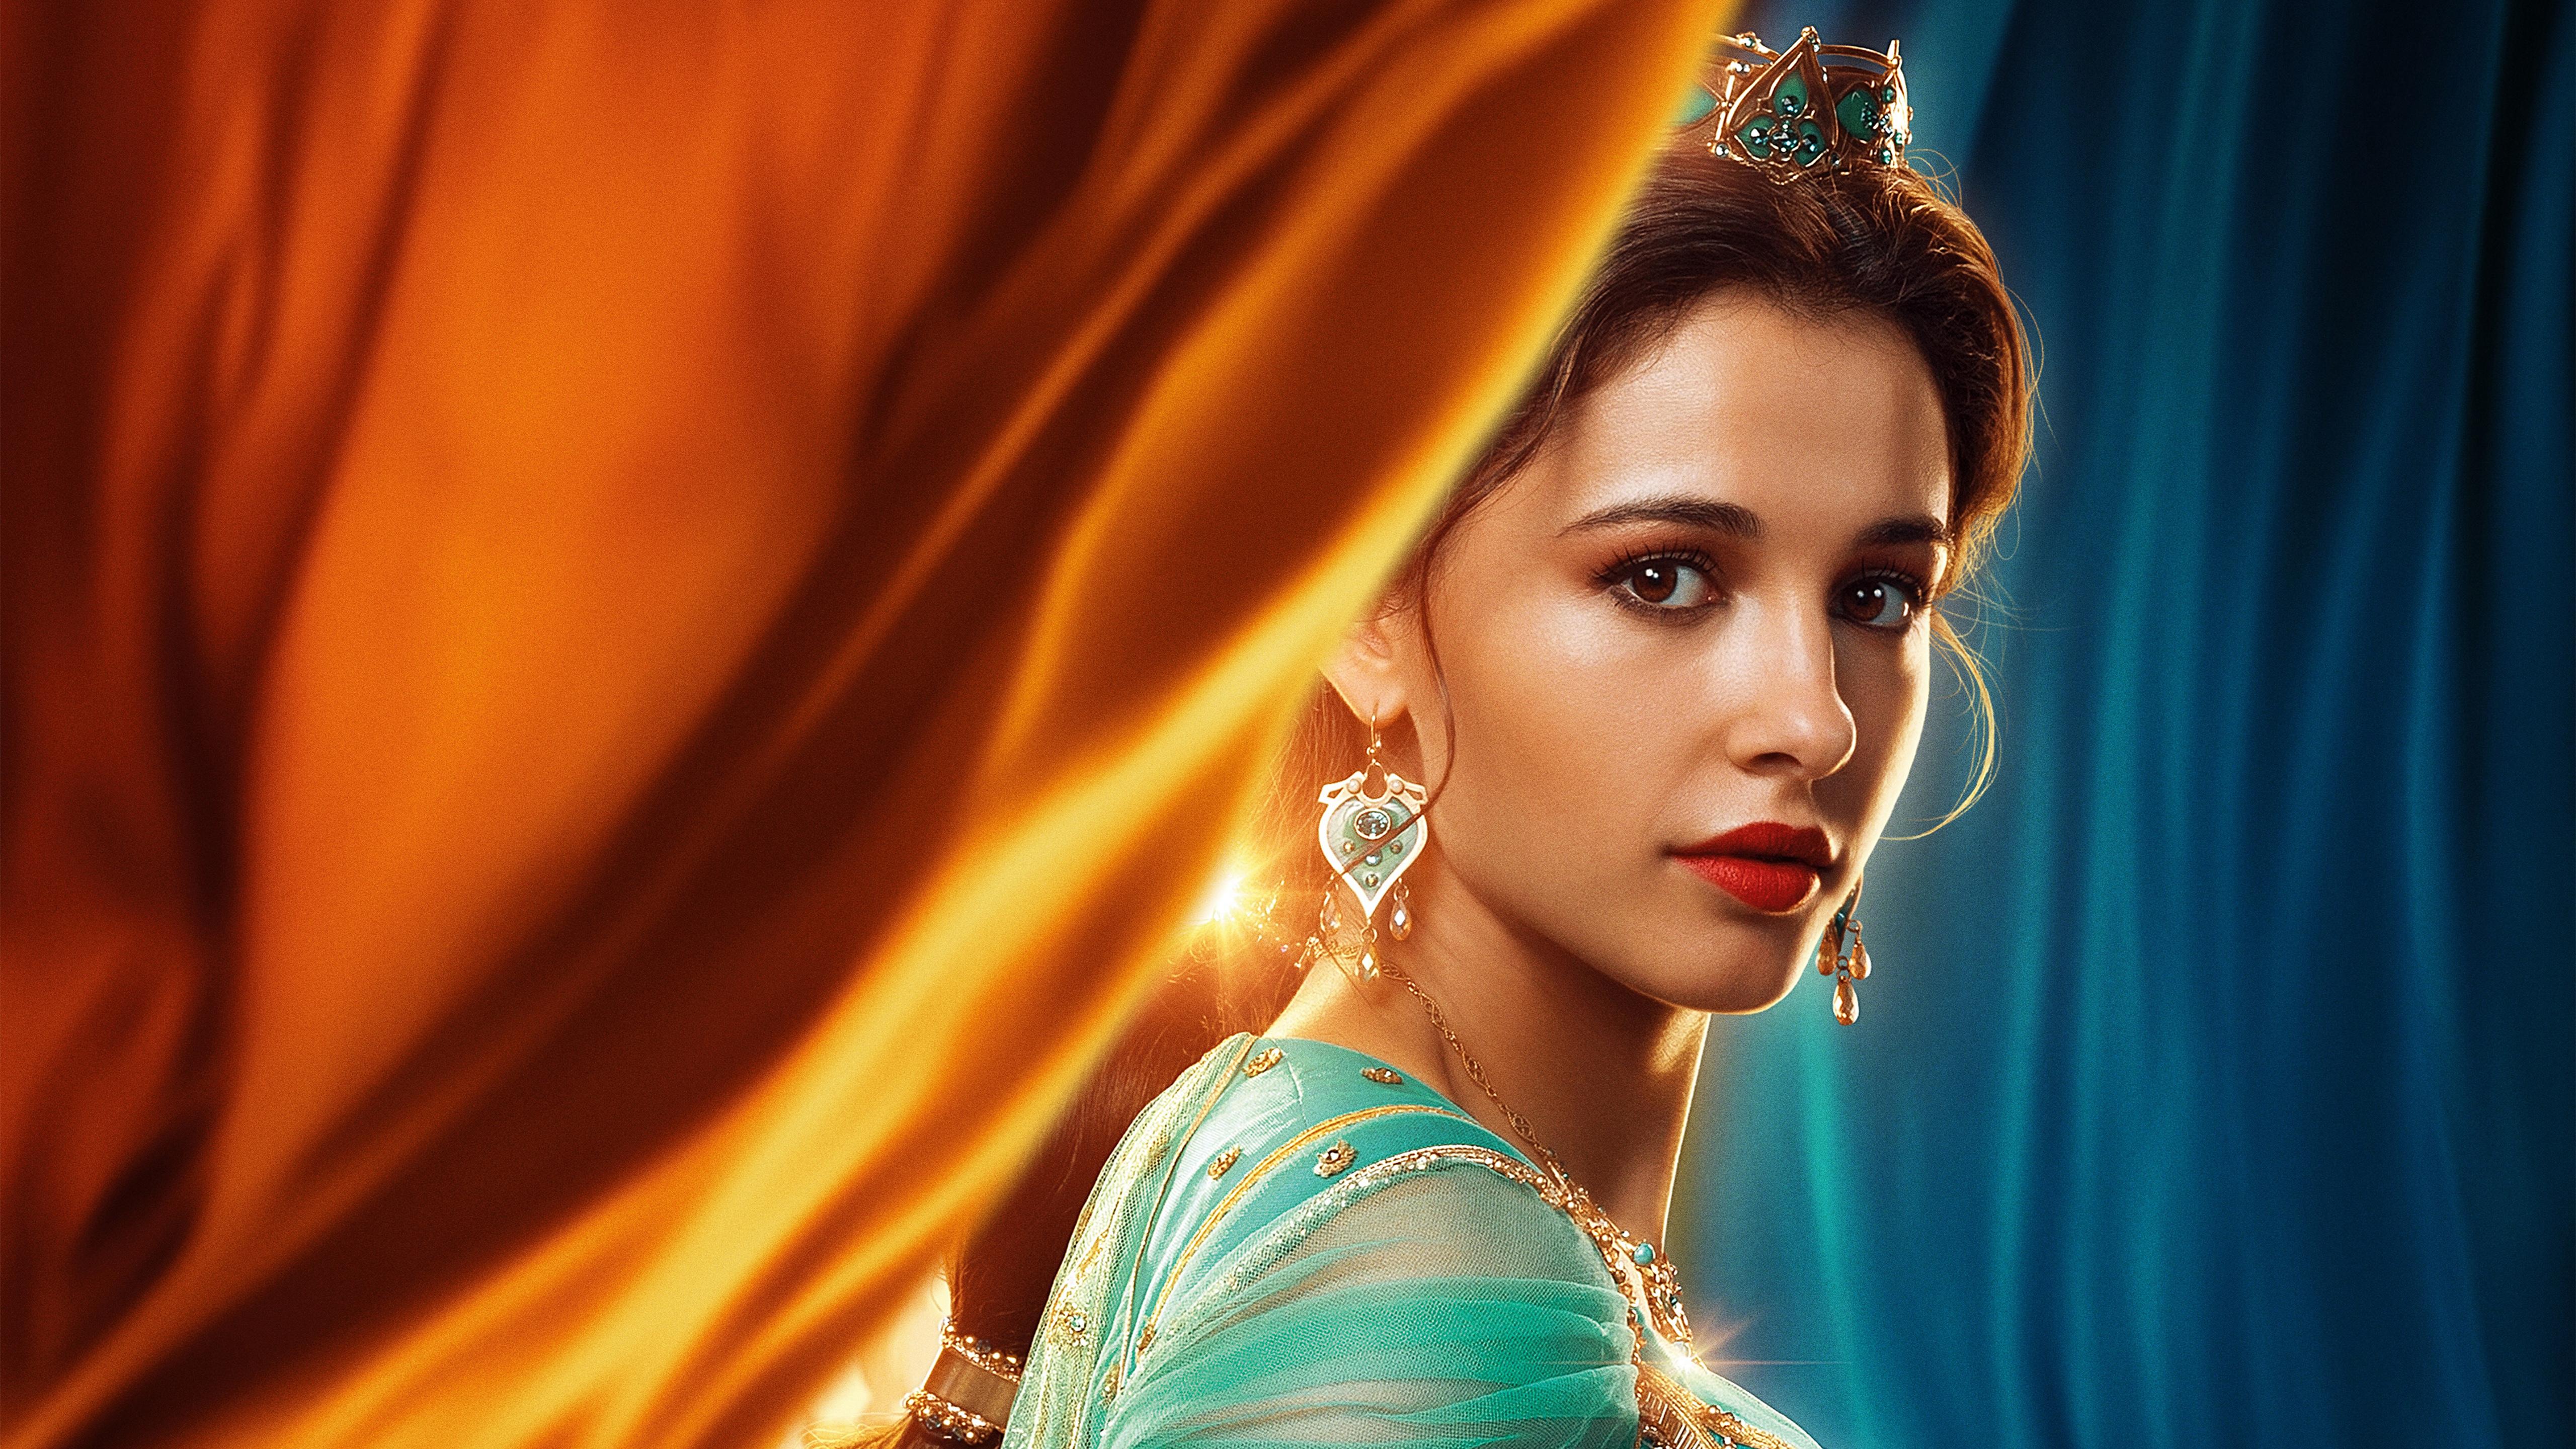 Naomi Scott as Princess Jasmine in Aladdin 2019 5K Wallpapers 5120x2880